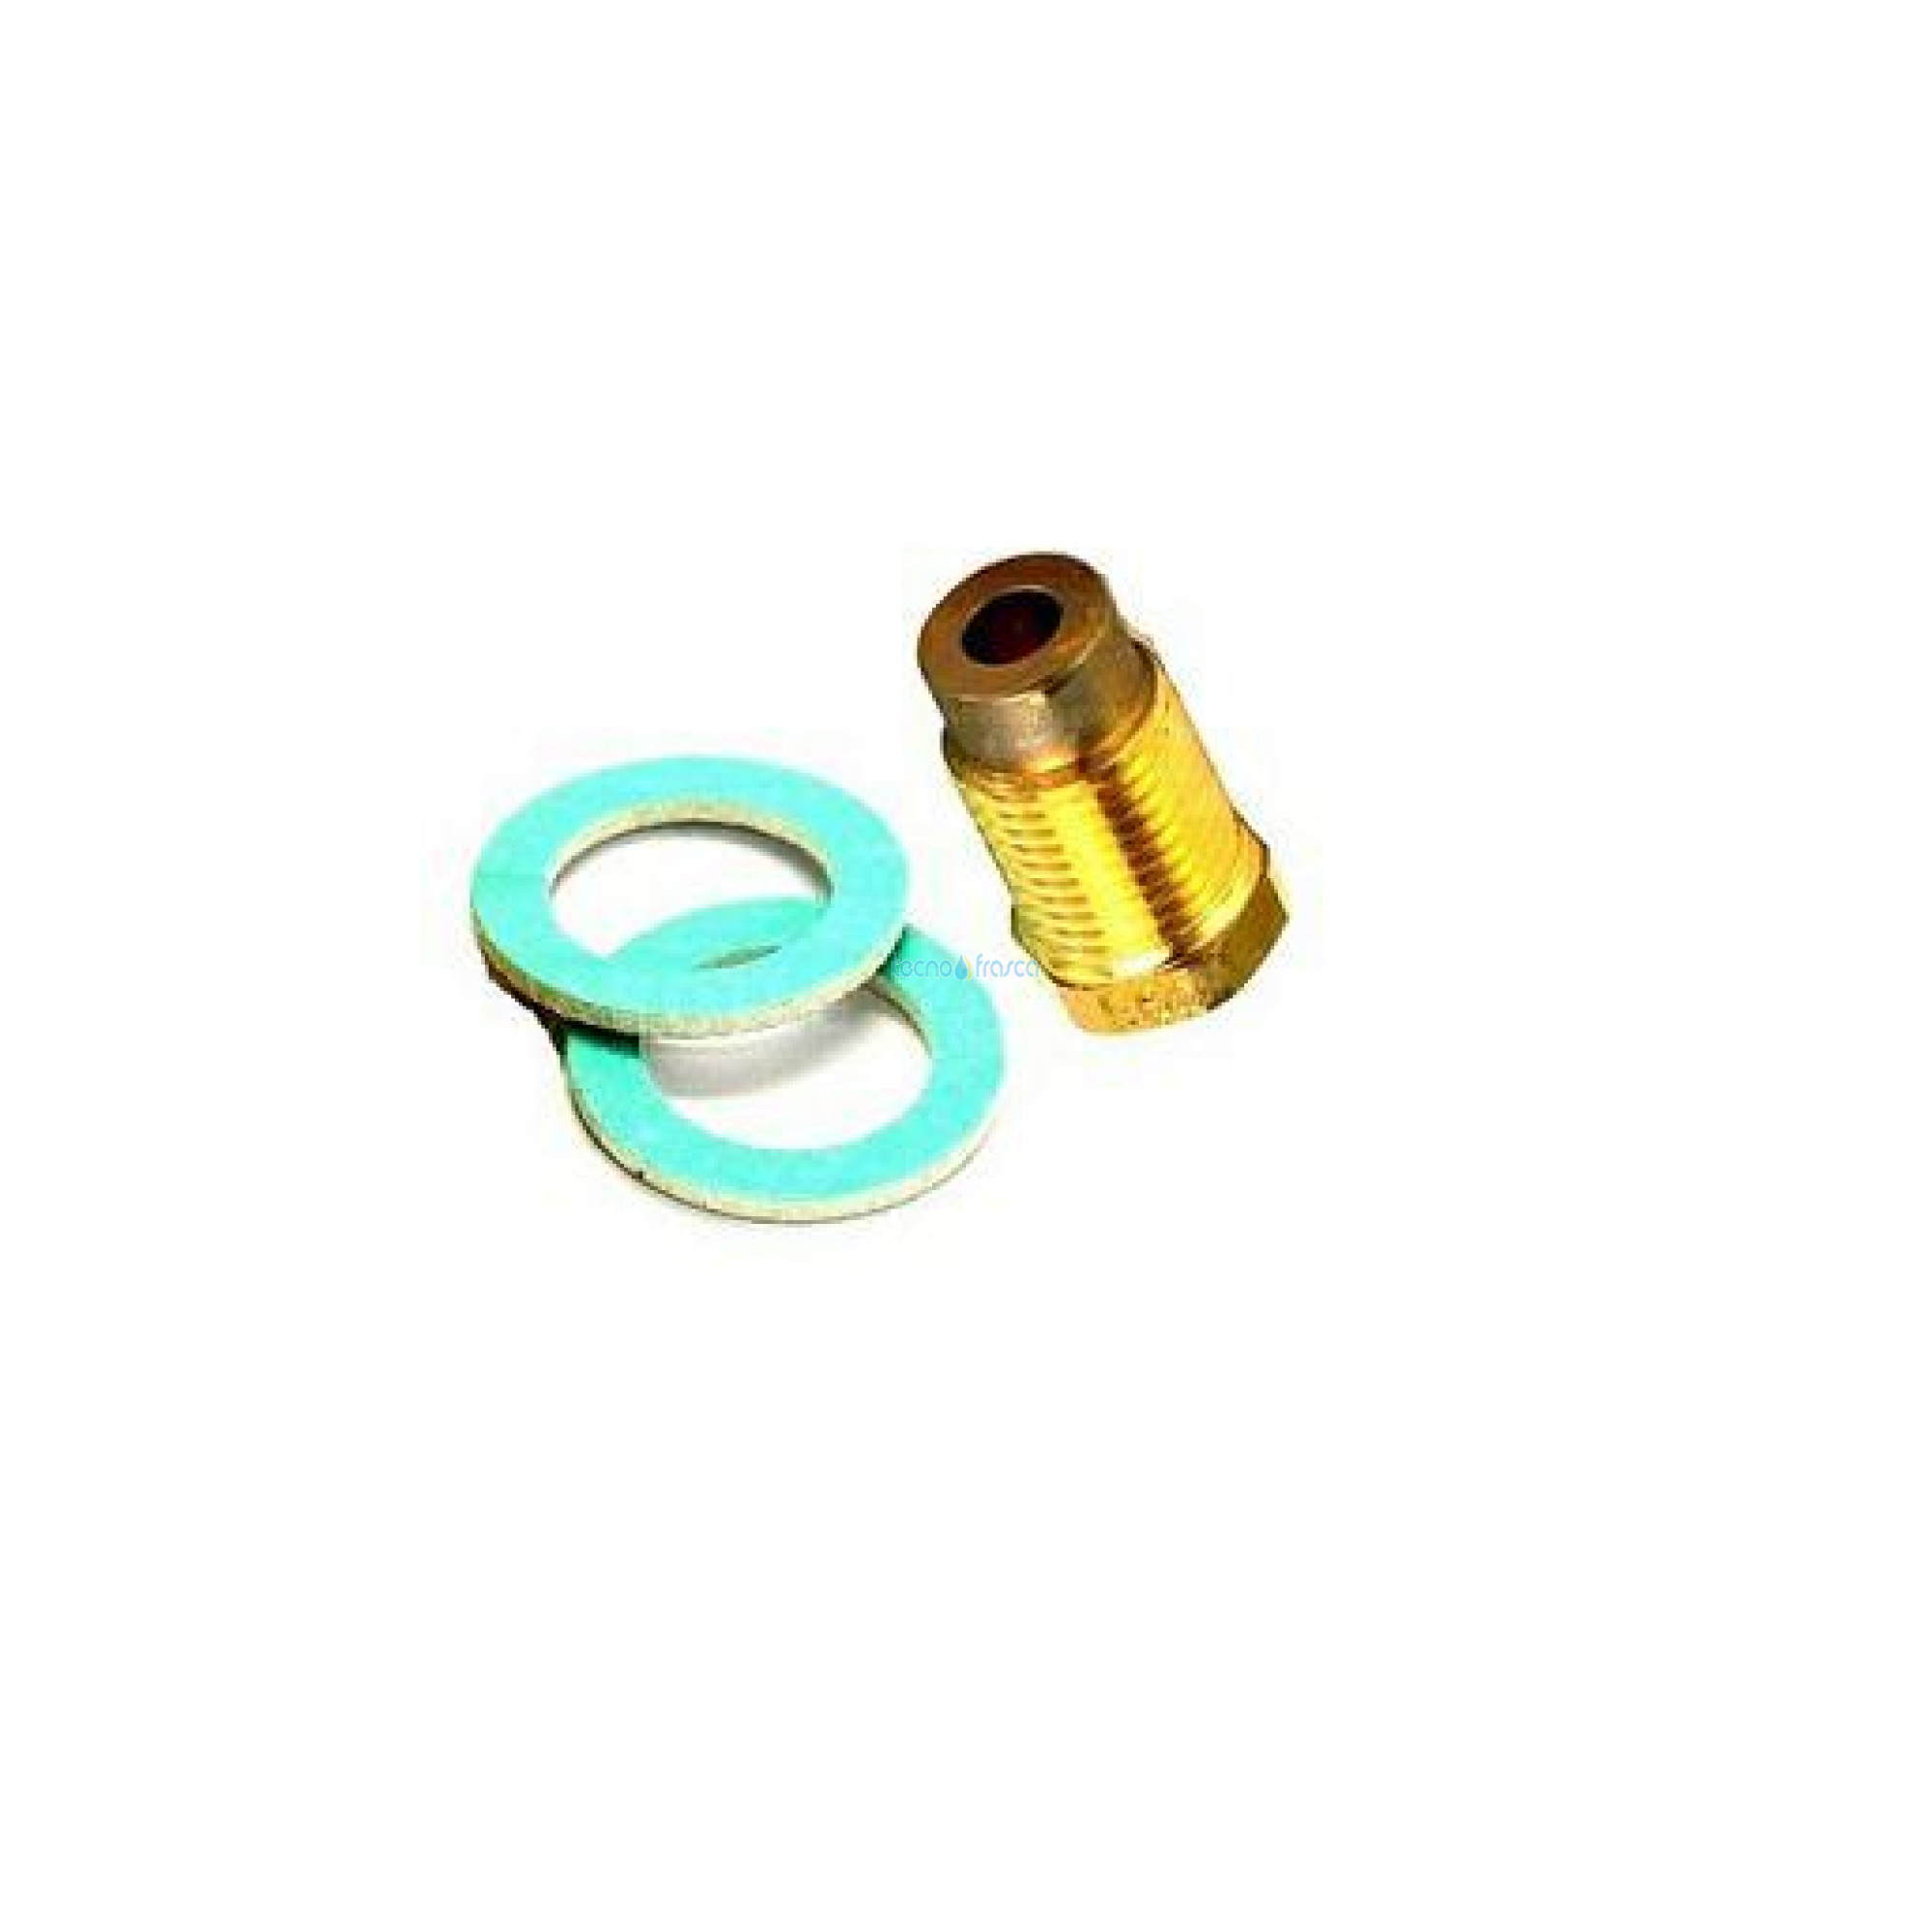 Immergas kit conversione gas g30-g31 1ugello d4,00 1/4 3.019208